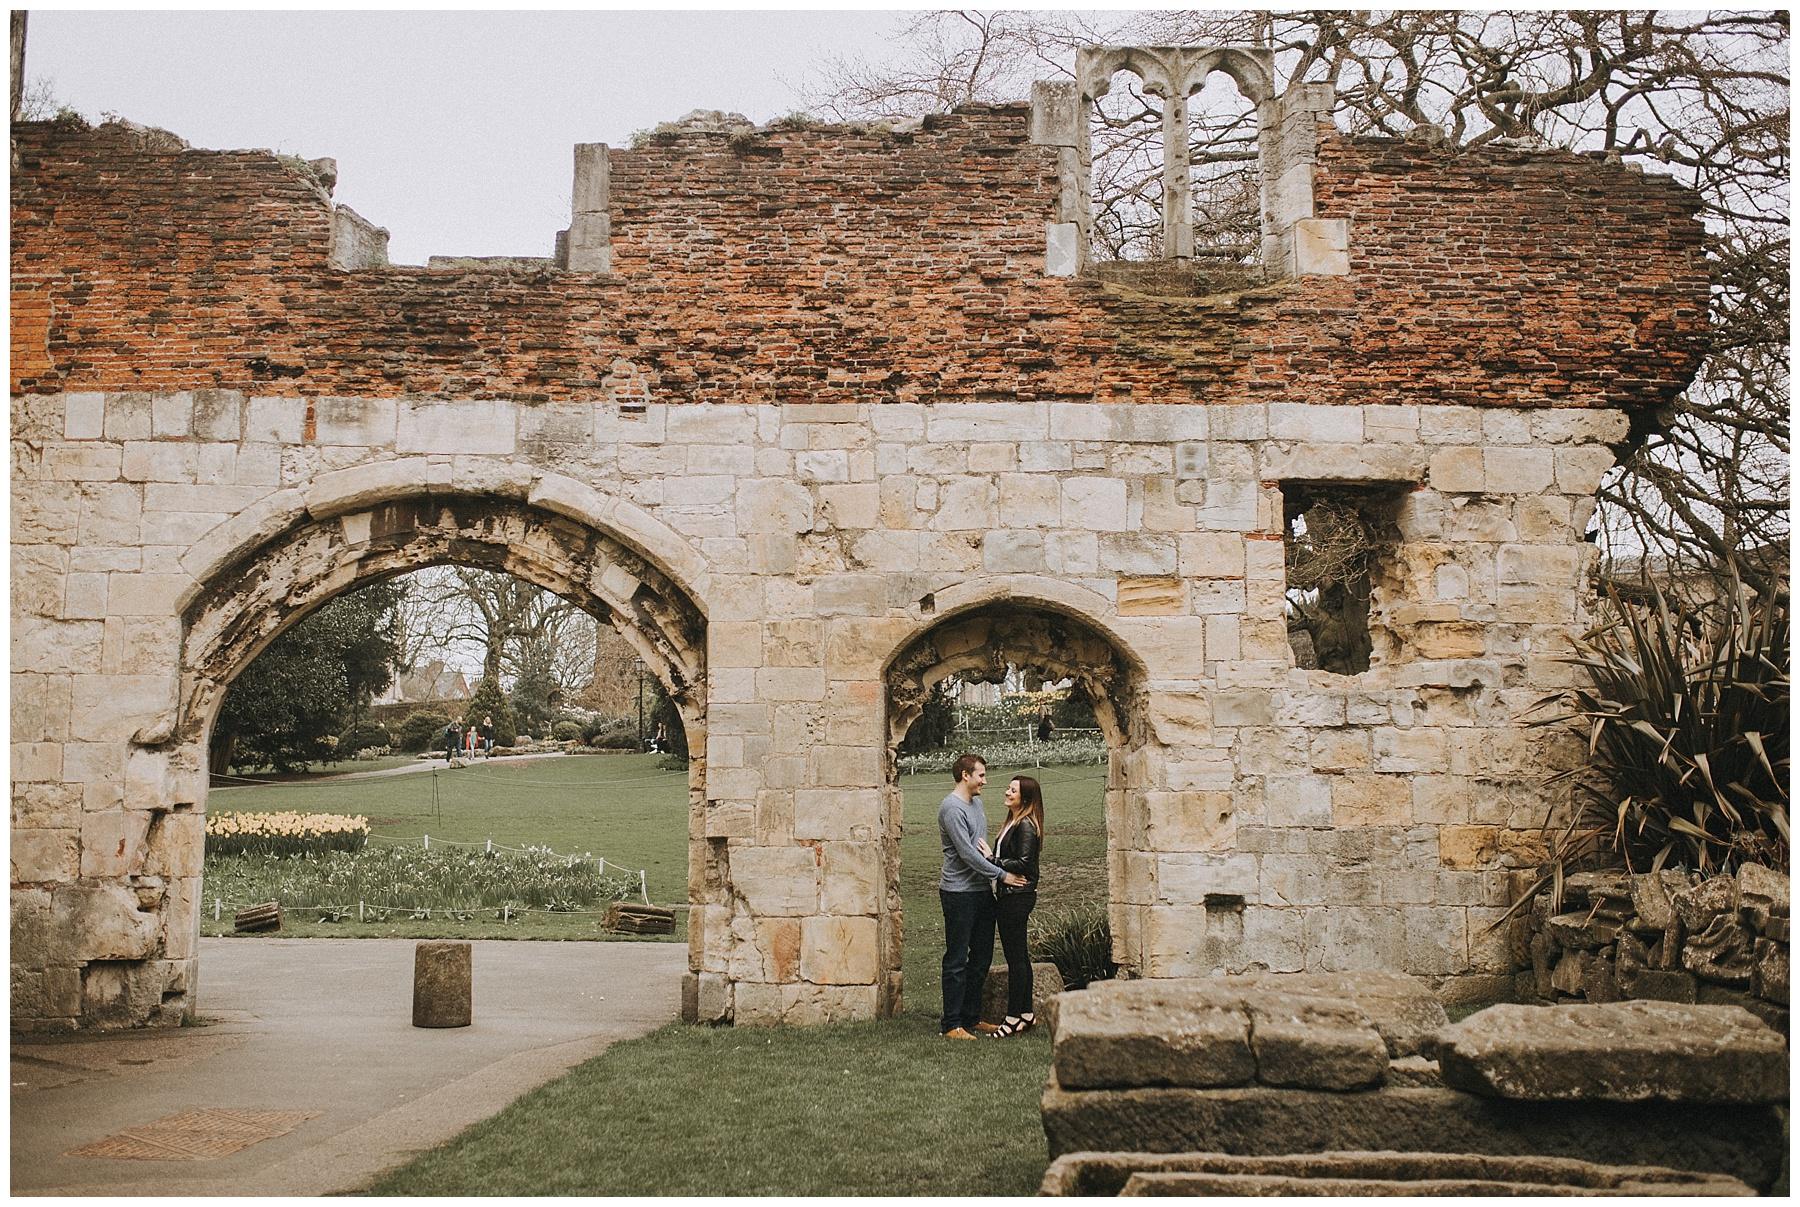 yorks museum gardens archway